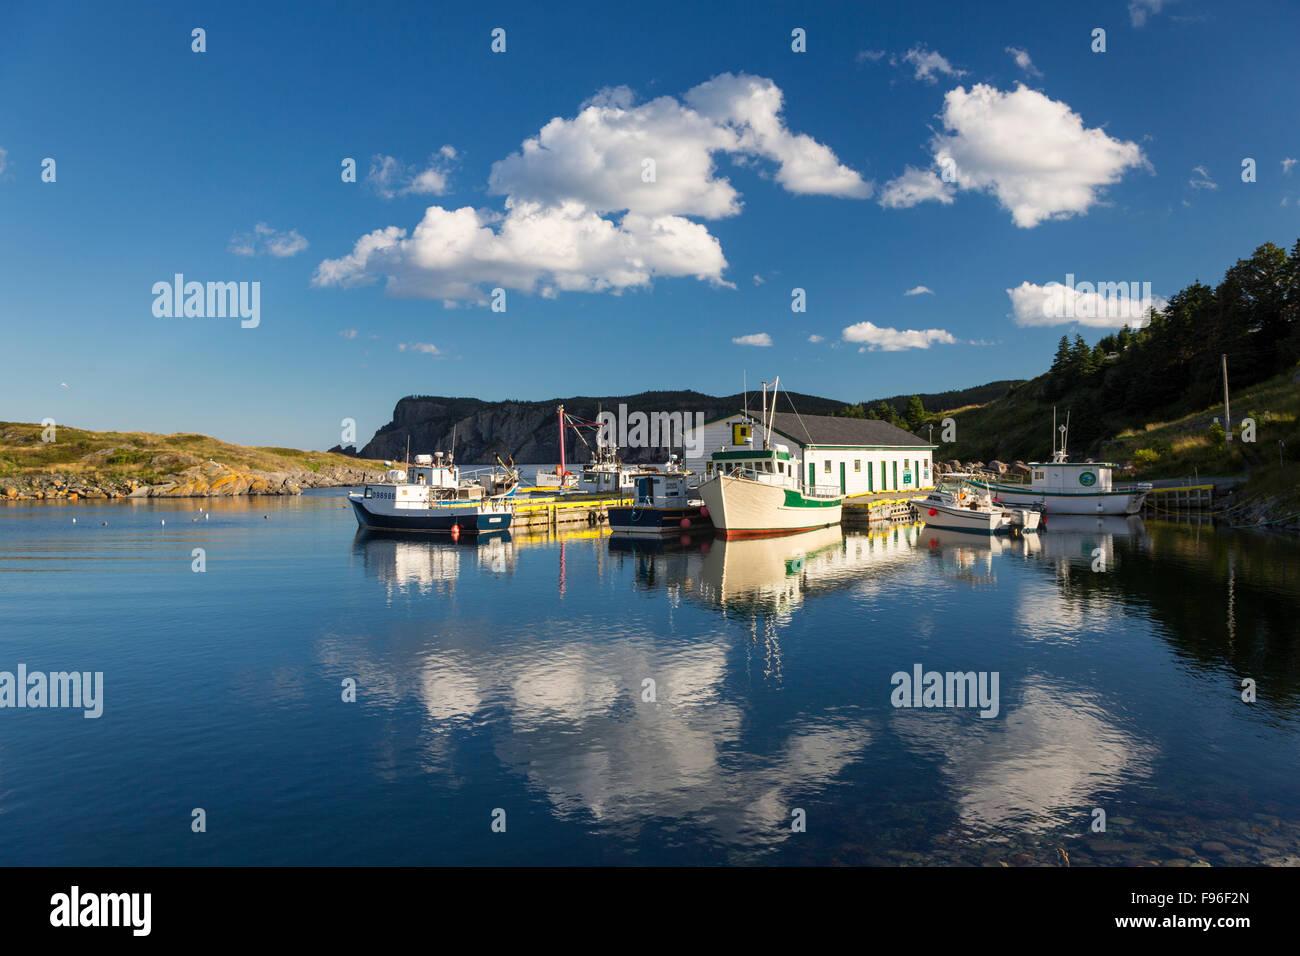 Fishing boats tied up at wharf, Brigus South, Newfoundland, Canada - Stock Image